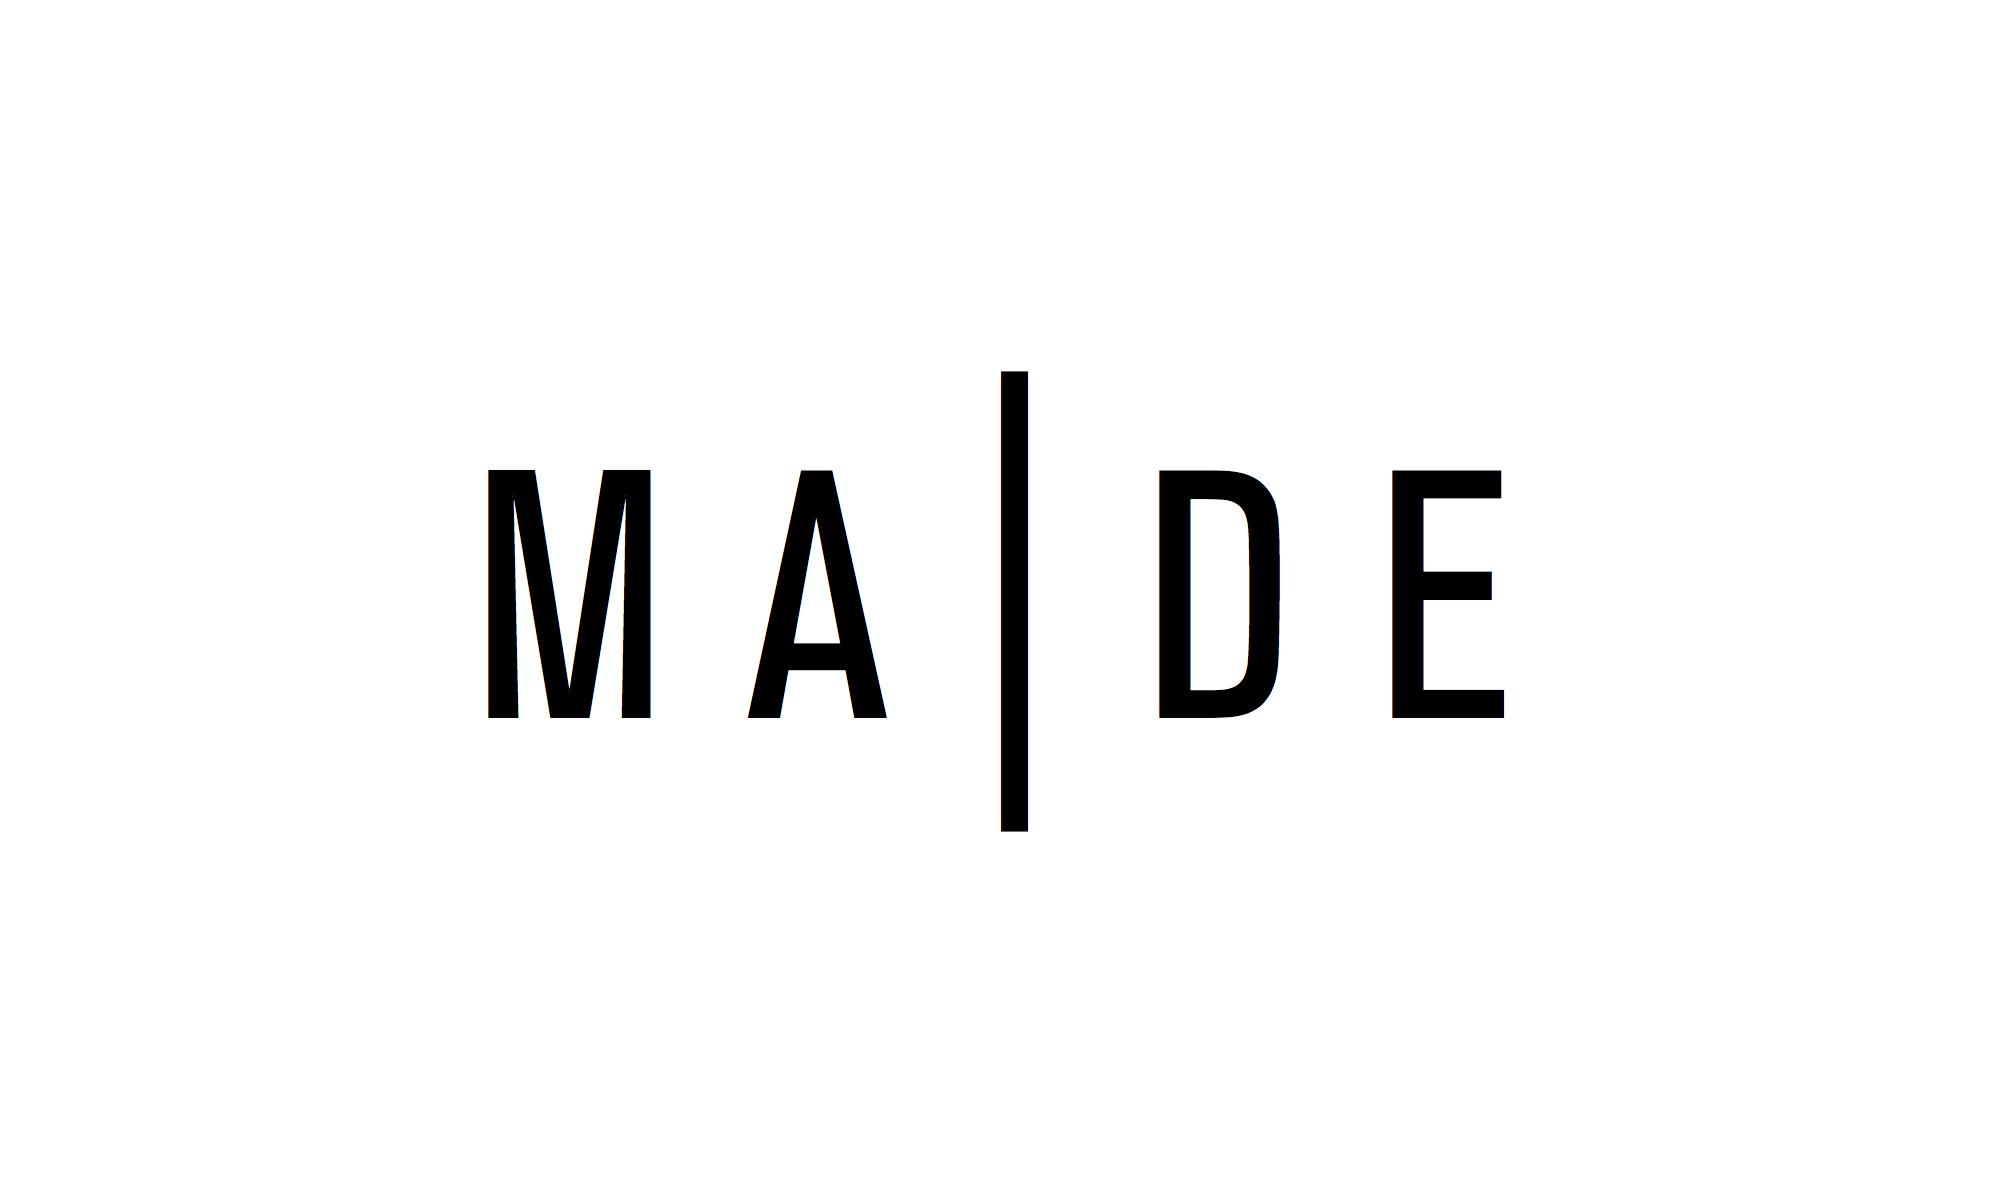 MA|DE